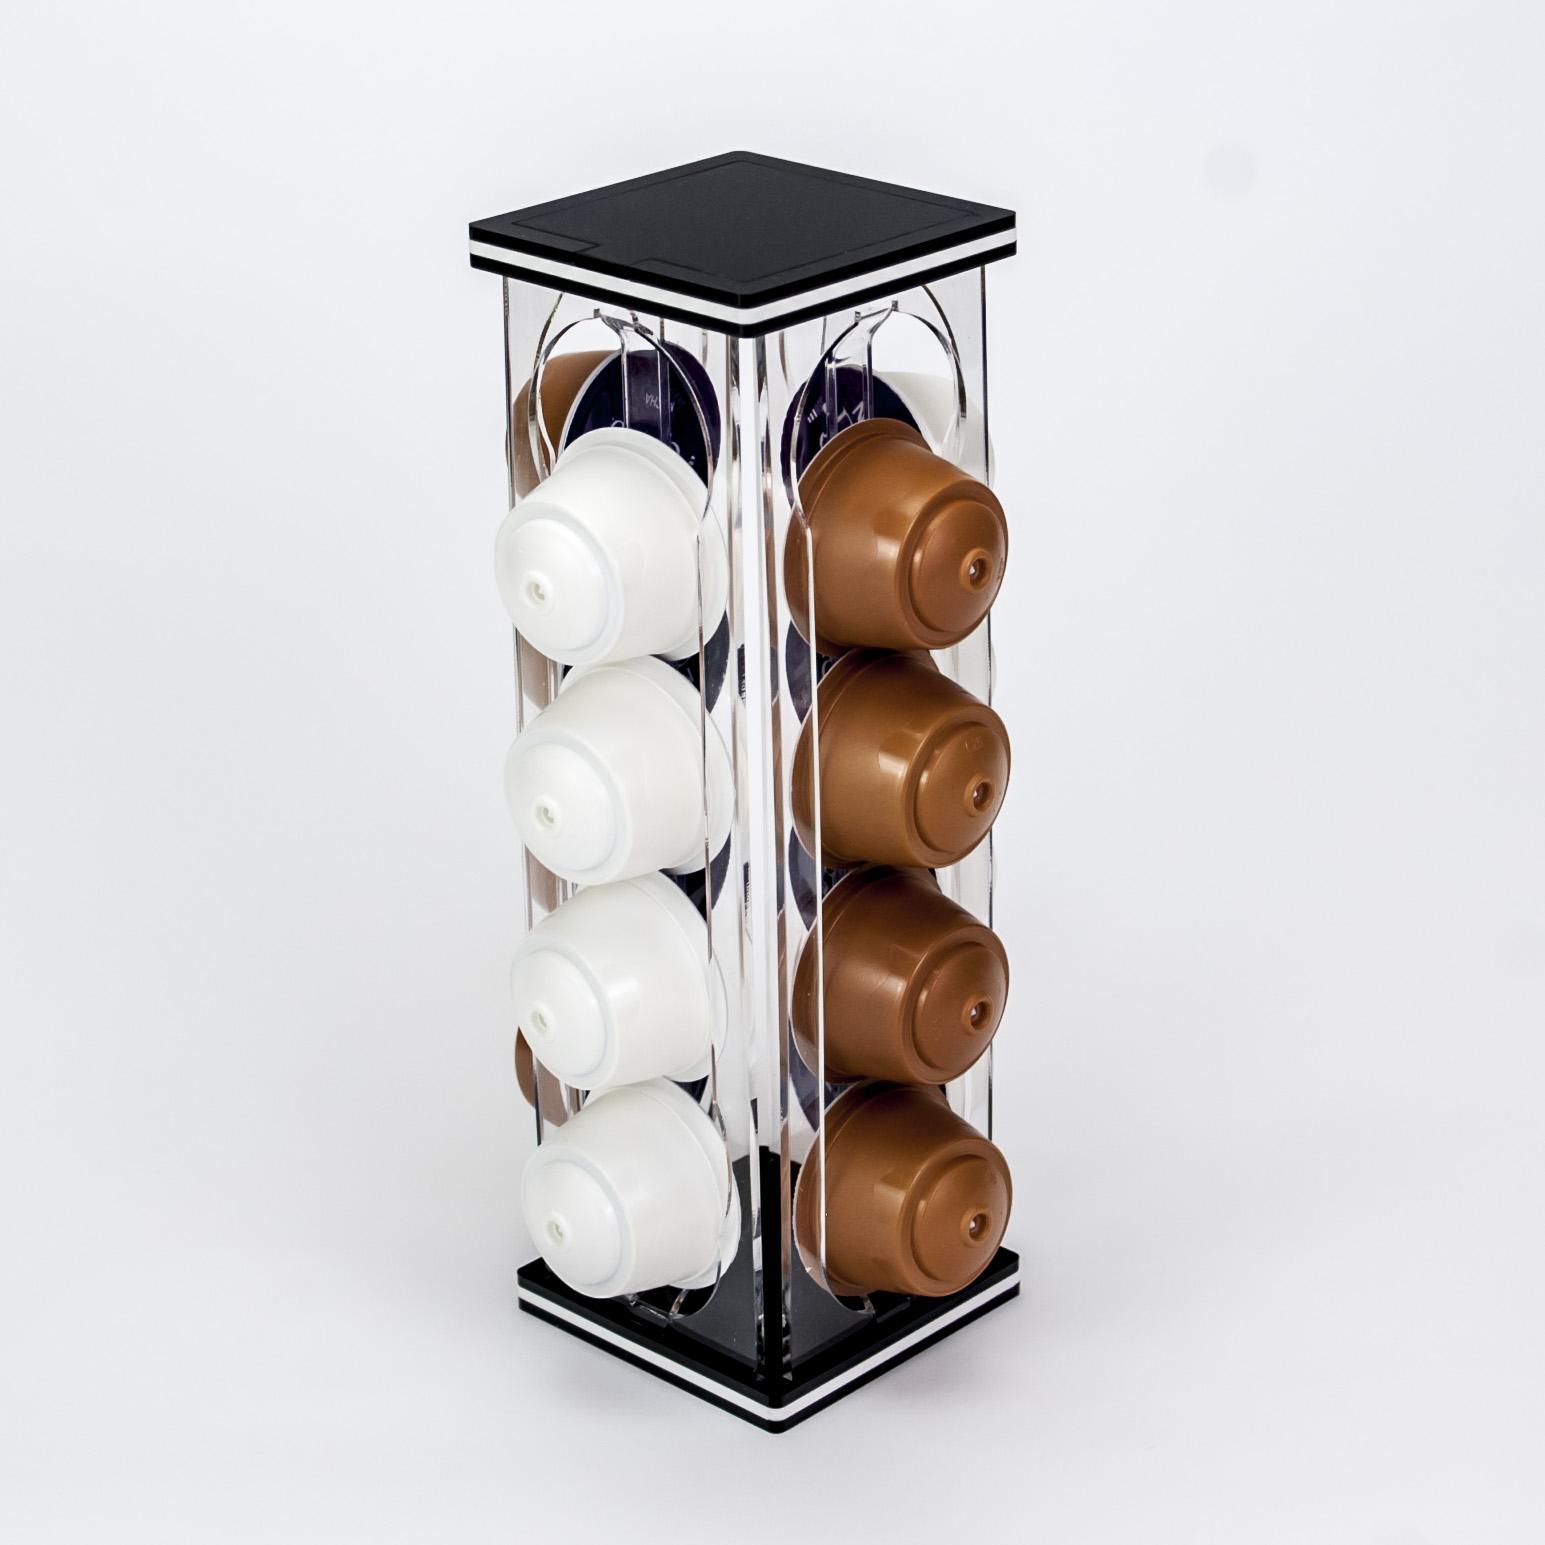 dolce gusto porte capsule cheap porte capsule dolce gusto pas cher images et porte capsule. Black Bedroom Furniture Sets. Home Design Ideas